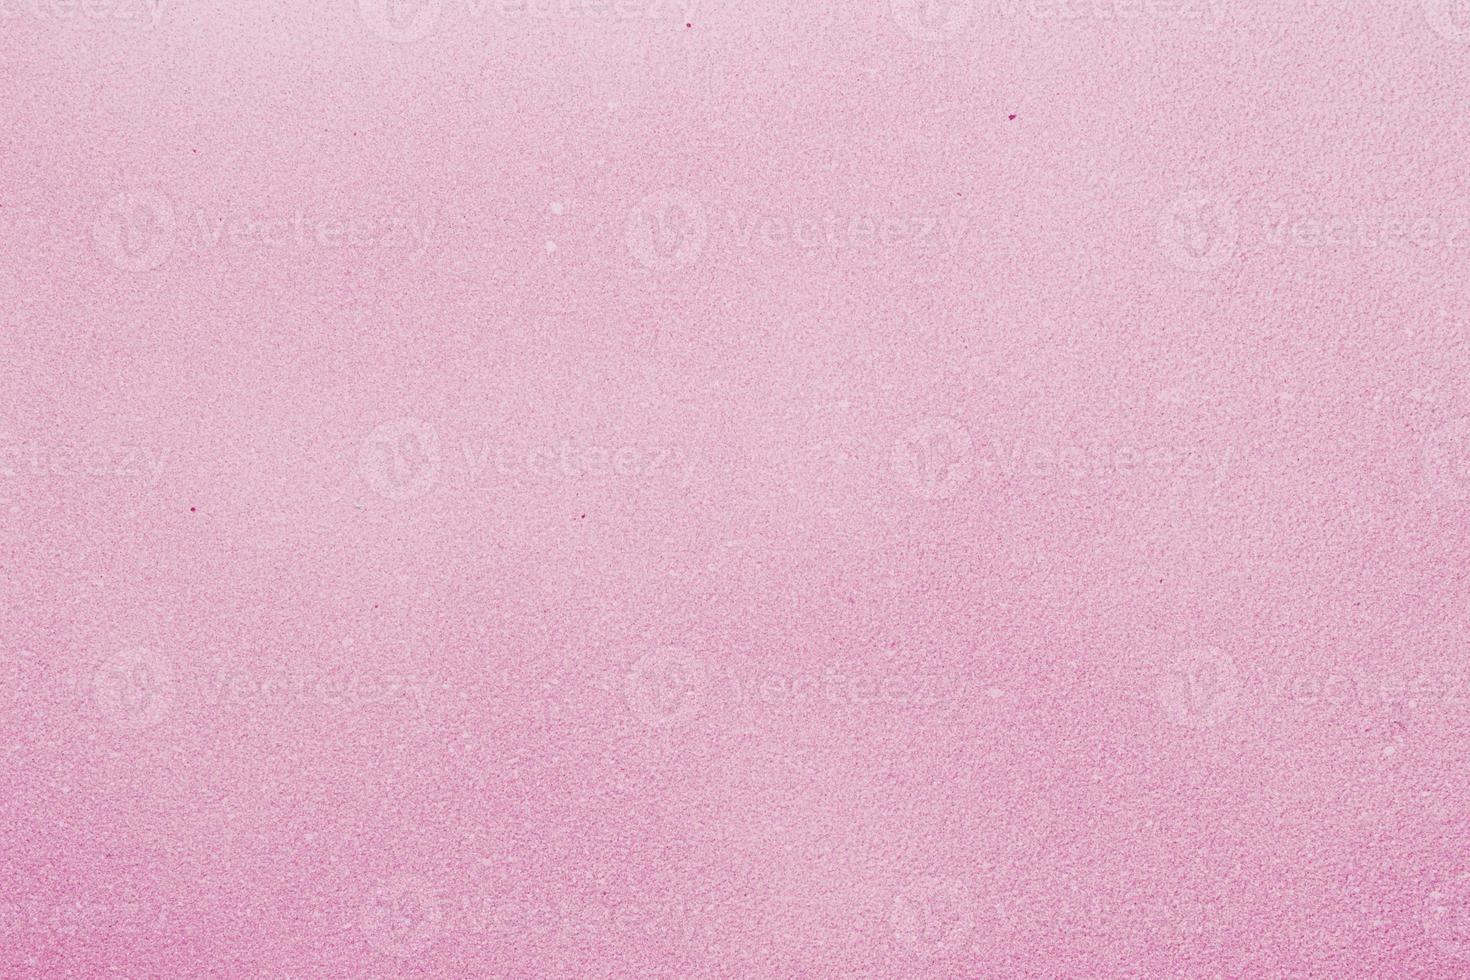 struttura rosa monocromatica vuota foto